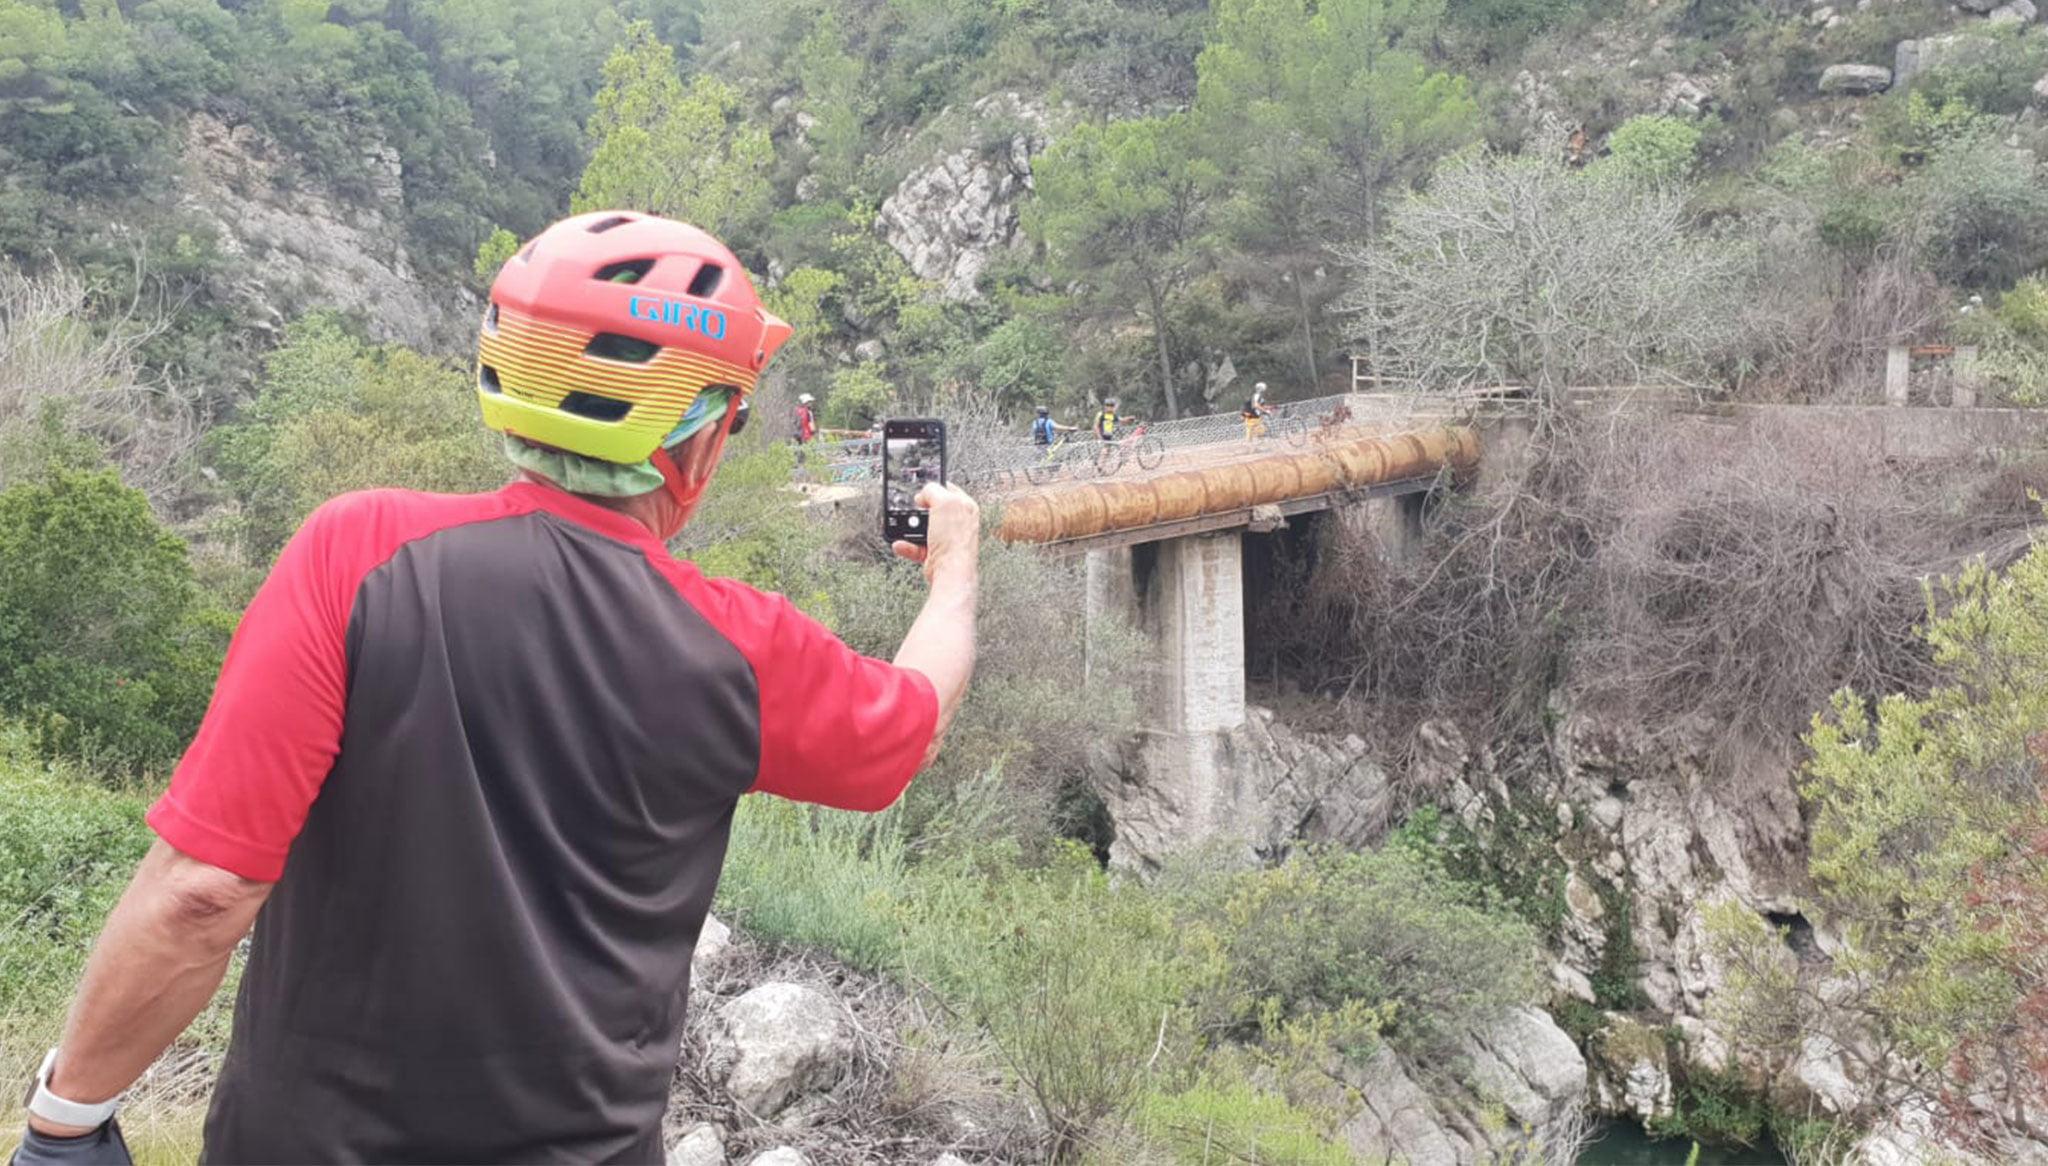 Paisaje en ruta de mountain bike durante un Training Camp – Aventura Pata Negra